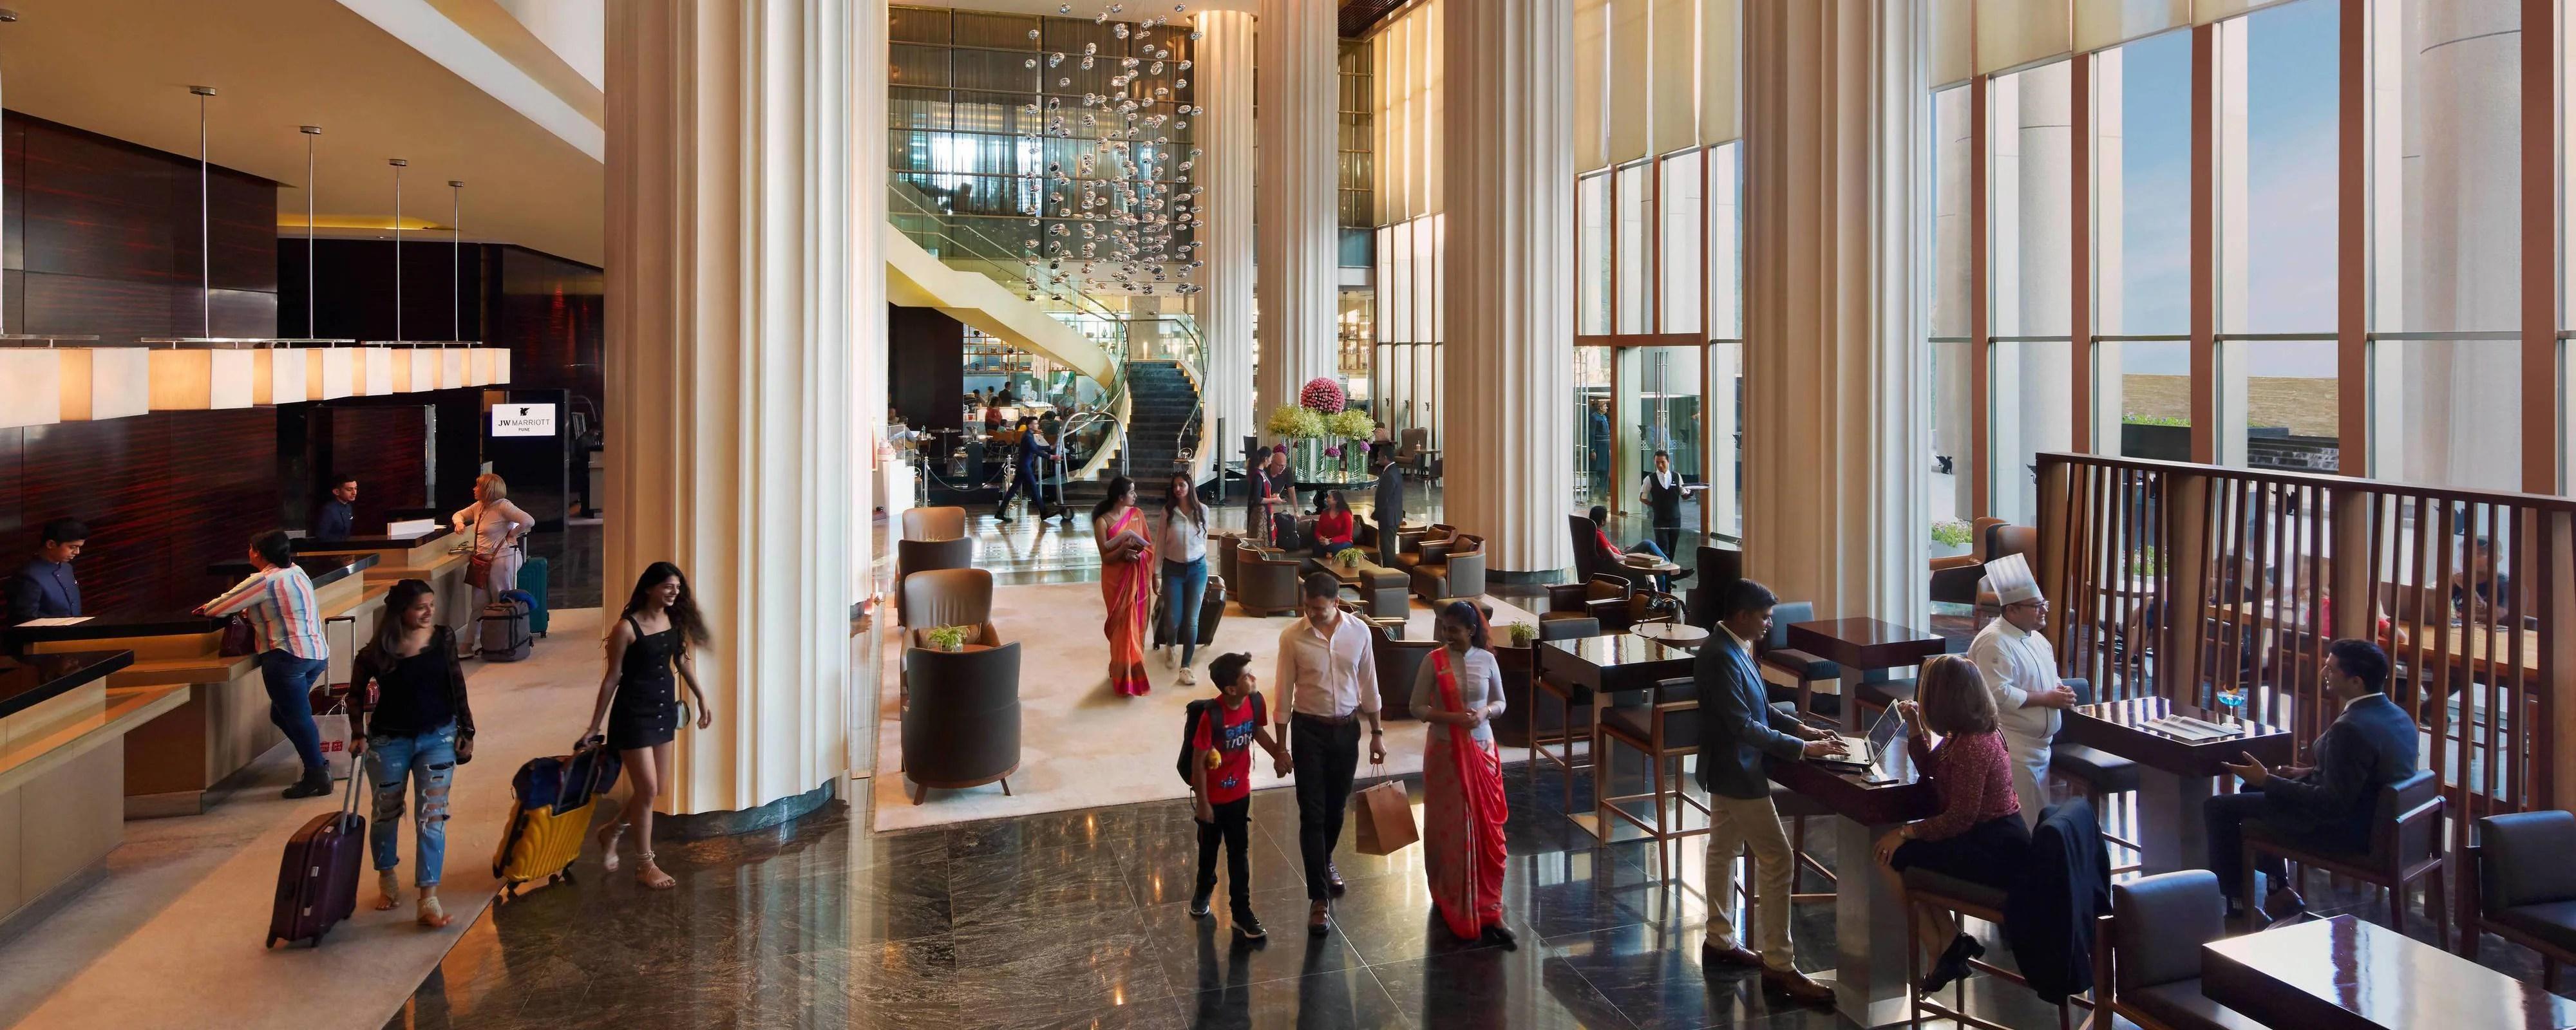 5 Star Luxury Hotel In Pune Jw Marriott Hotel Pune